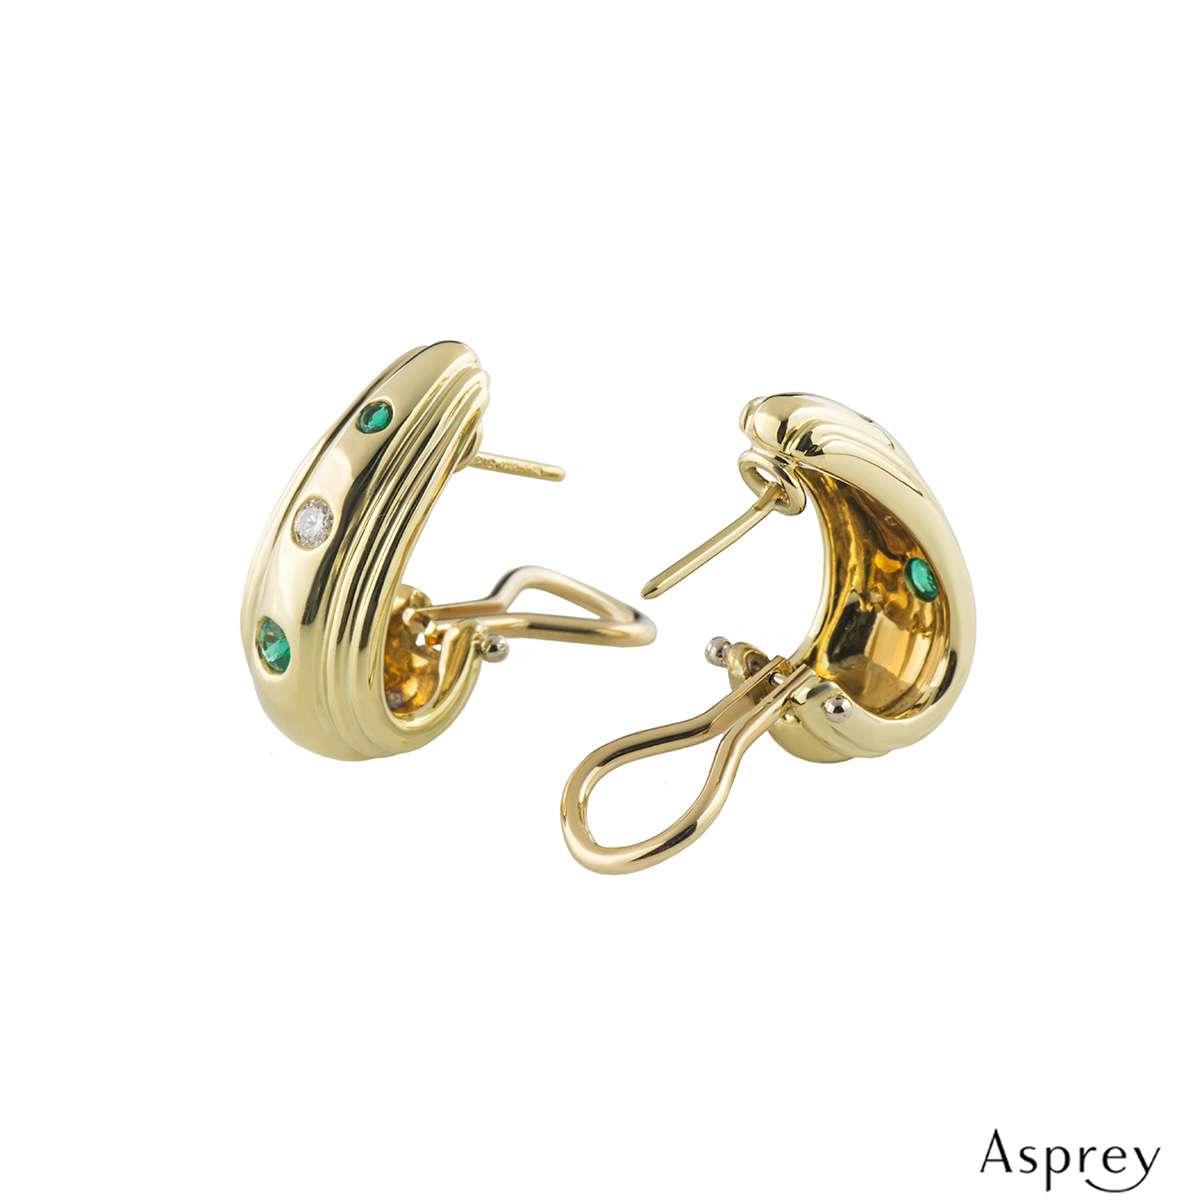 Asprey Diamond and Emerald Earrings